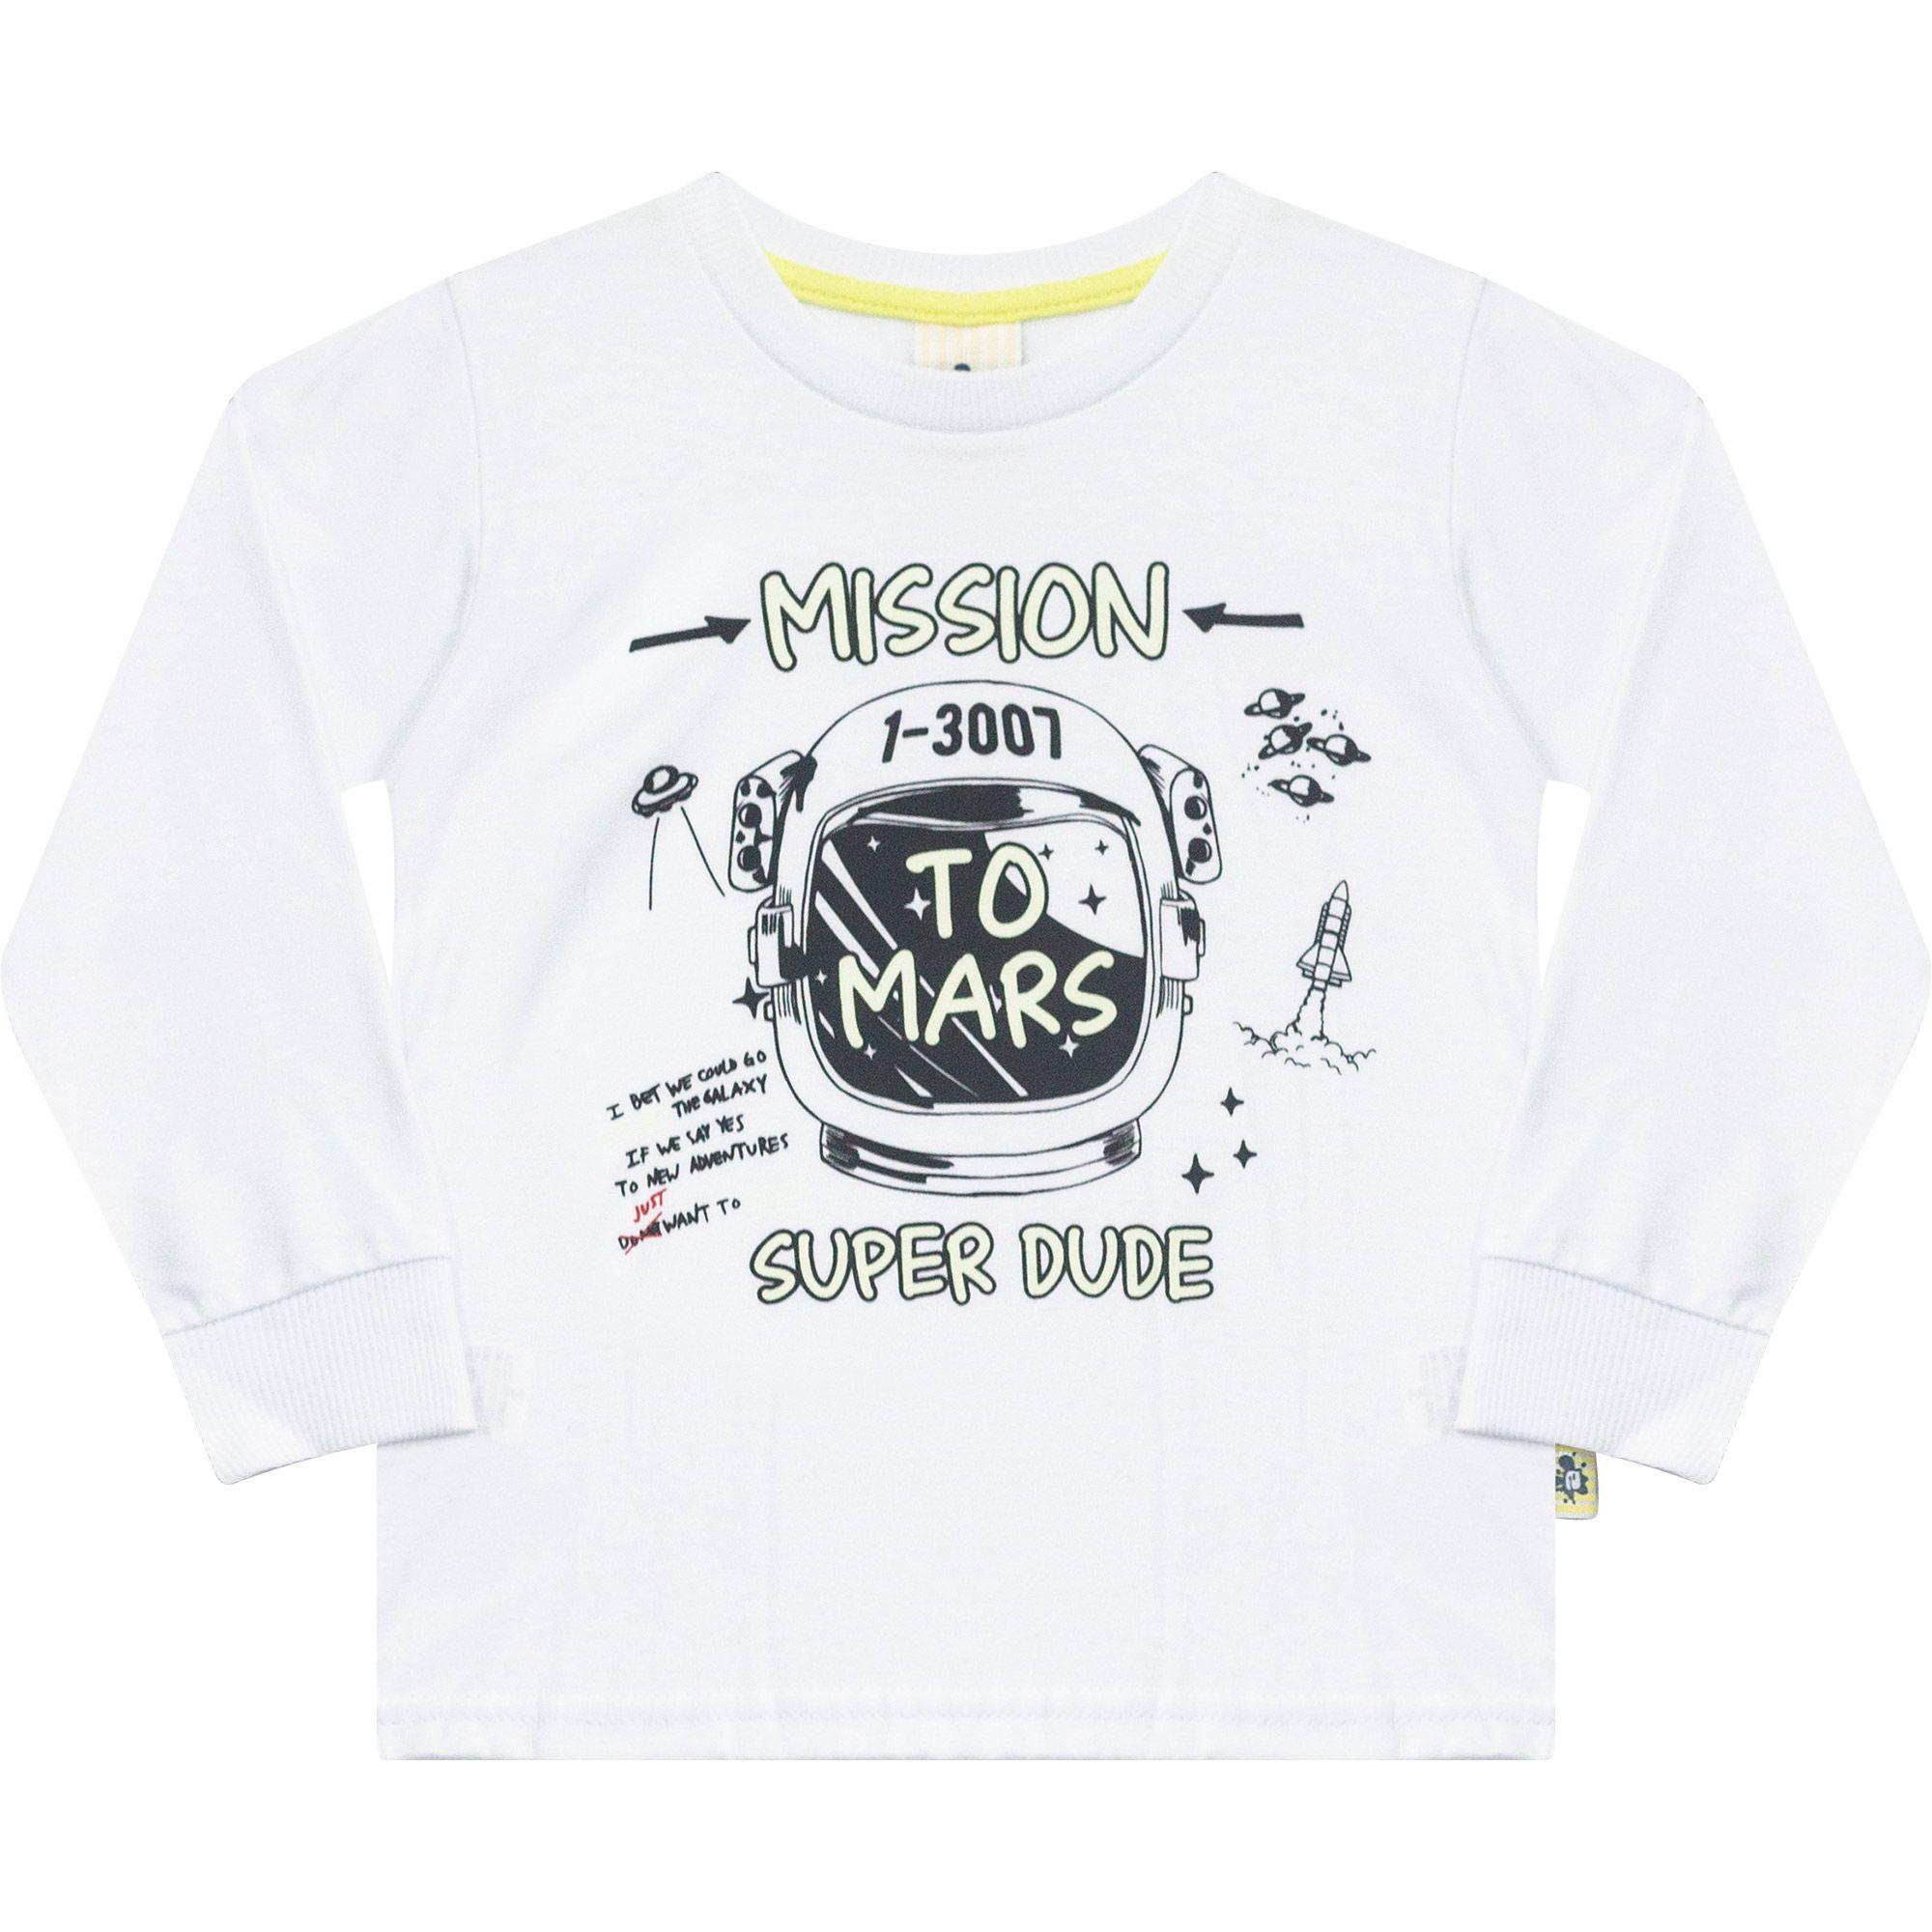 Camiseta Infantil em Malha  - Ref 4984 - Branco